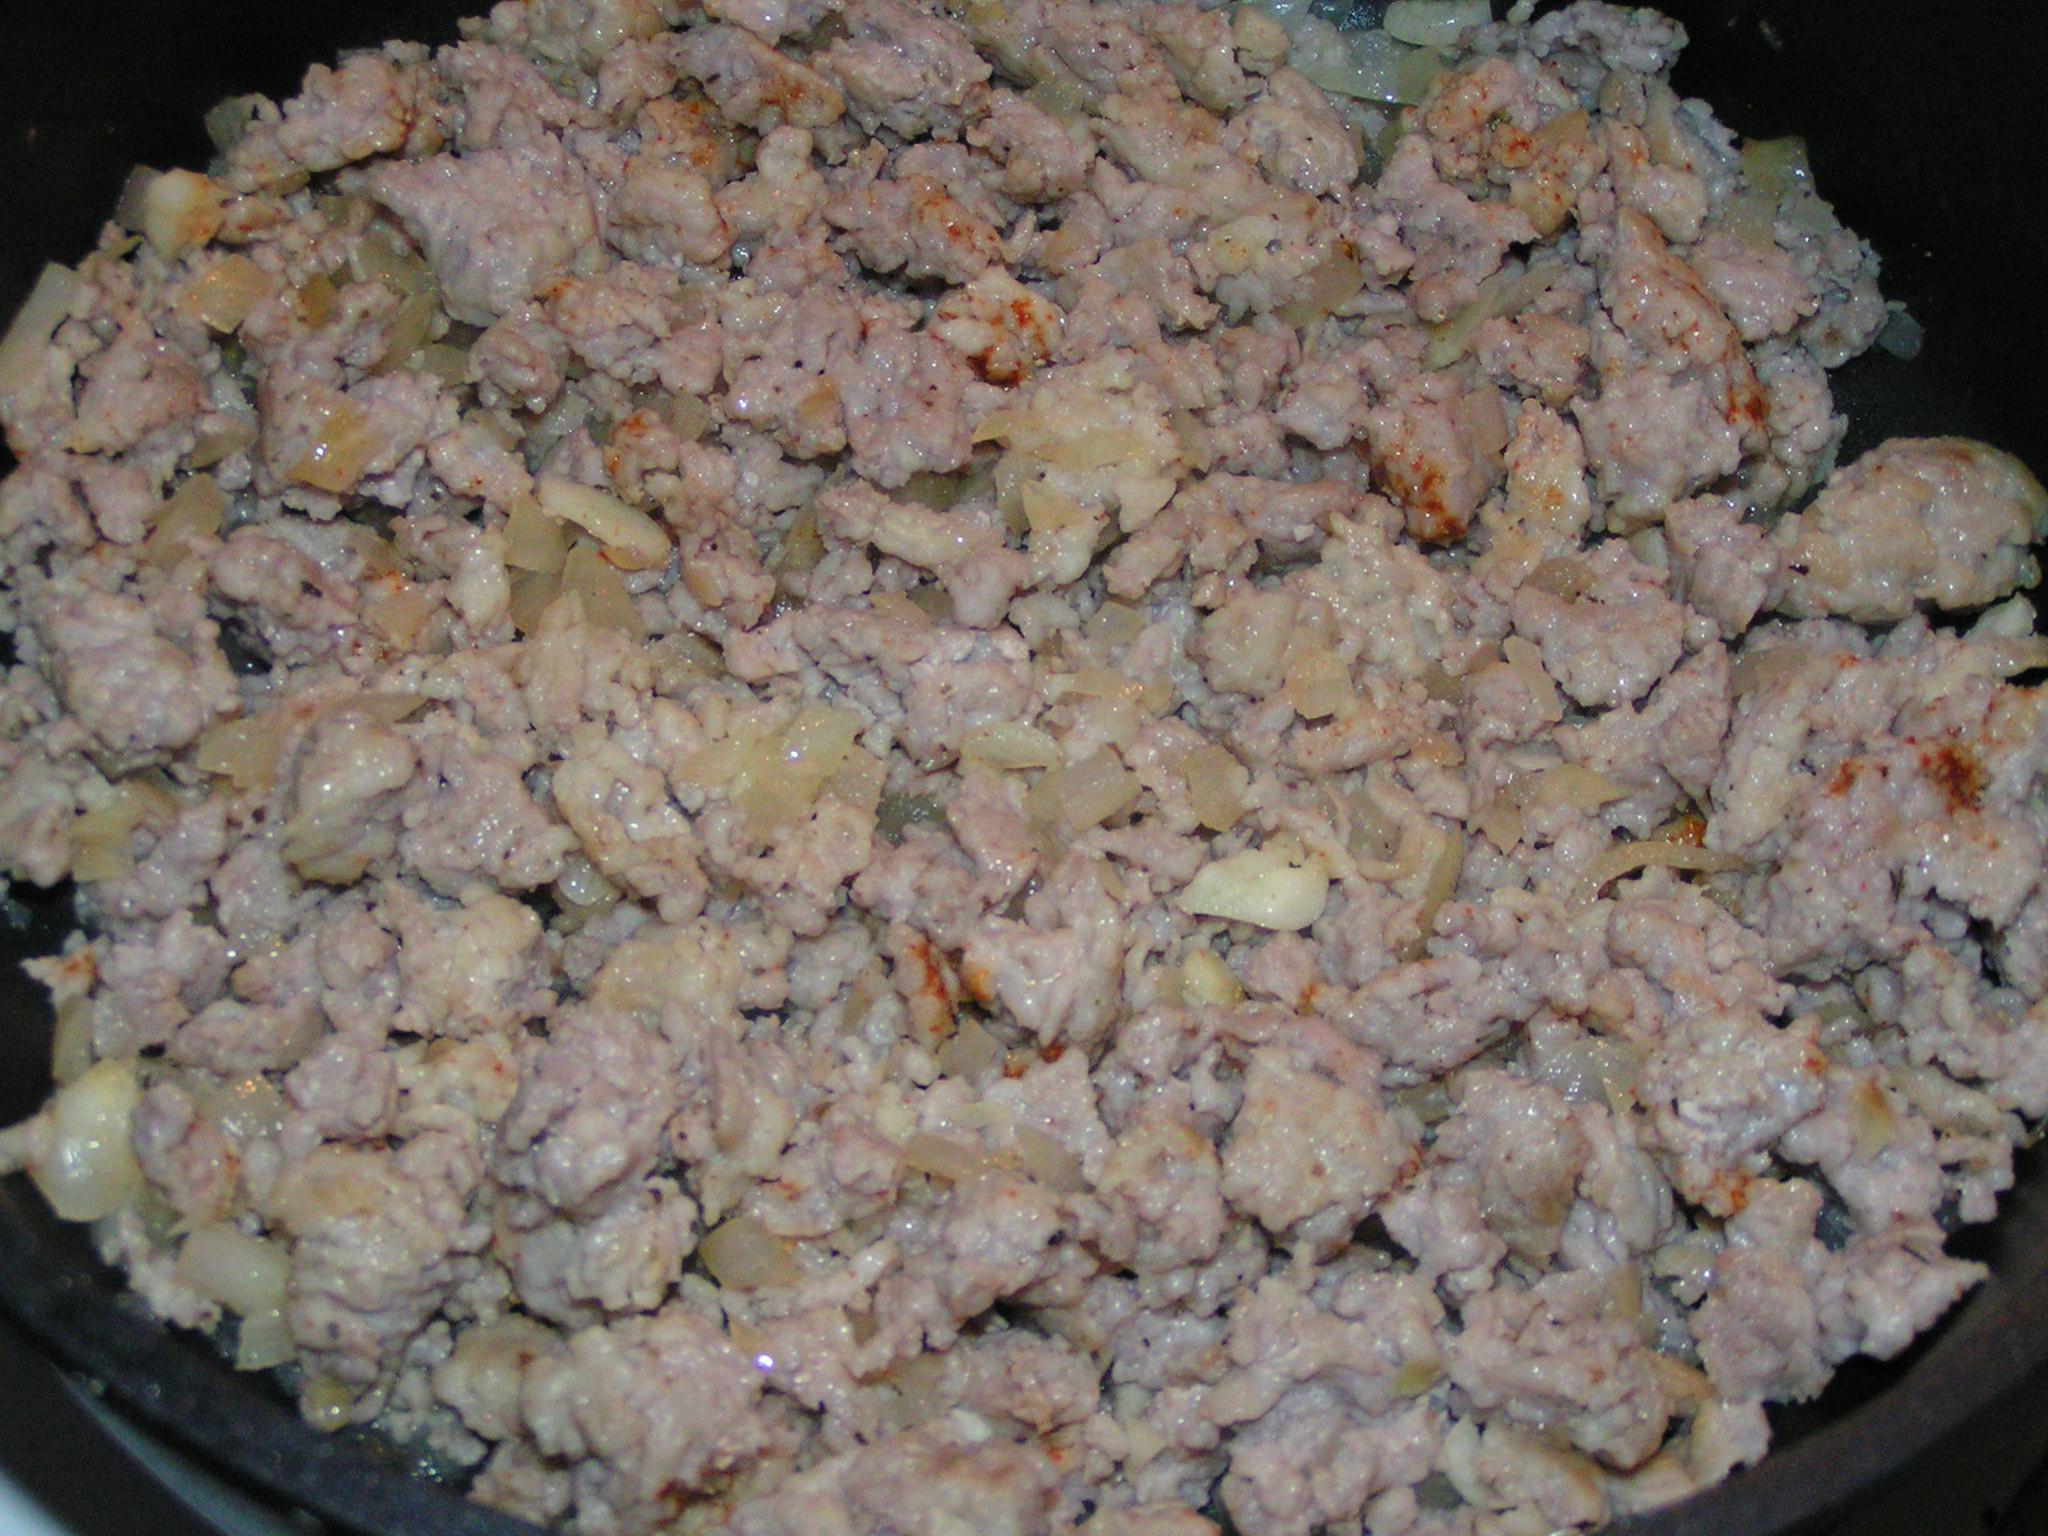 Recept Omáčka na špagety z mletého masa - Již orestované mleté maso s cibulkou.